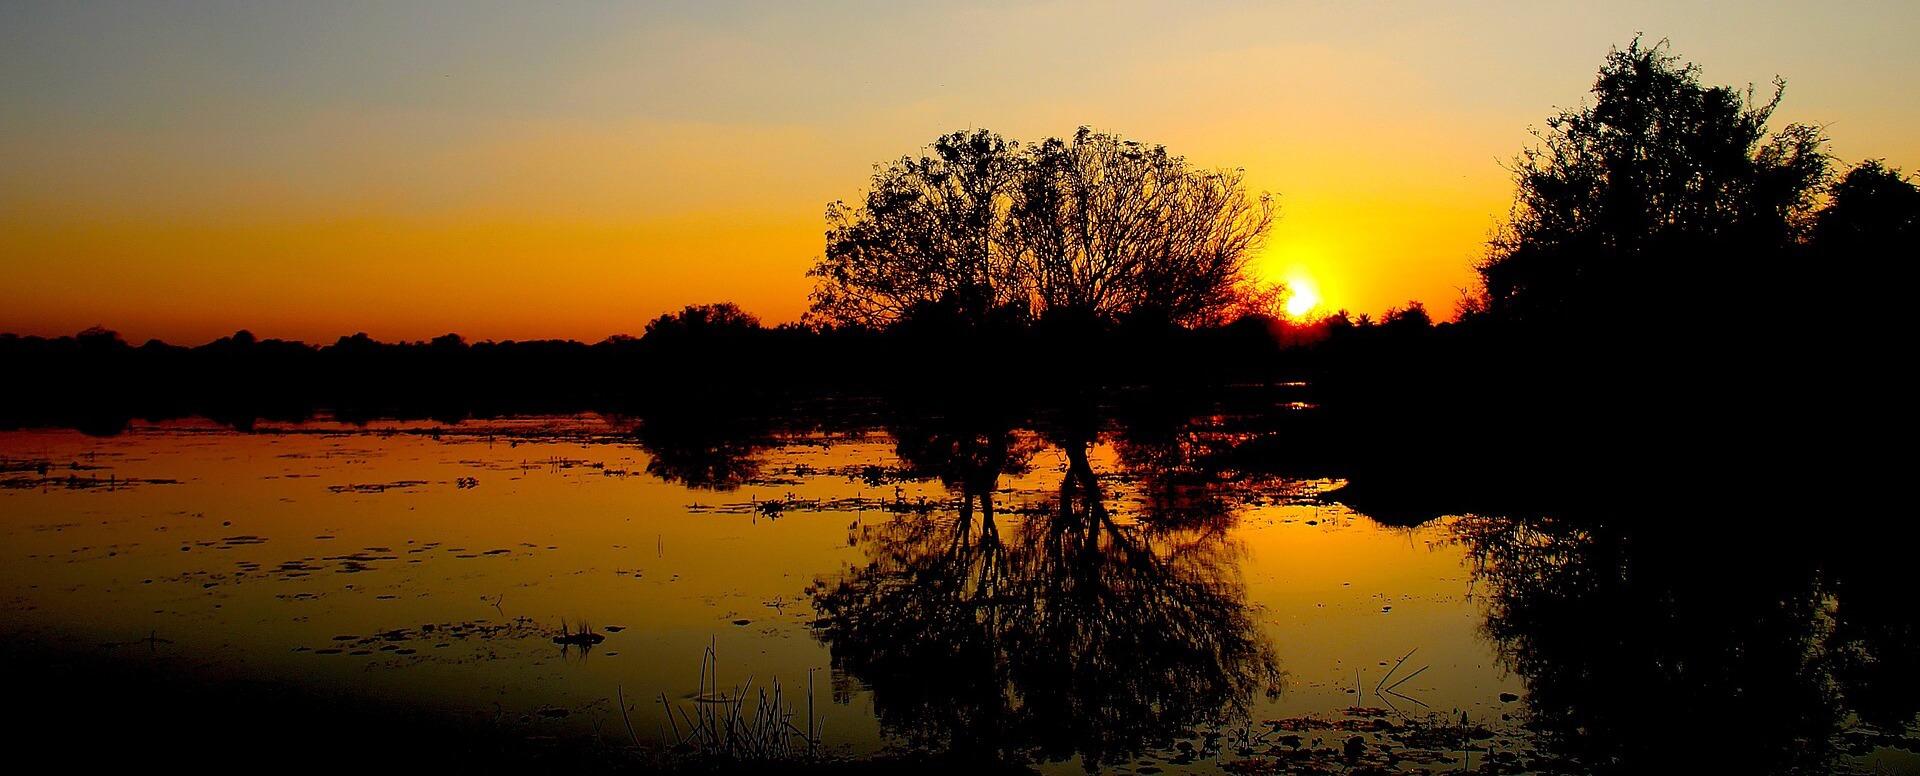 4. Admirer Anuradhapura et ses vestiges chargés d'histoire - Sri Lanka